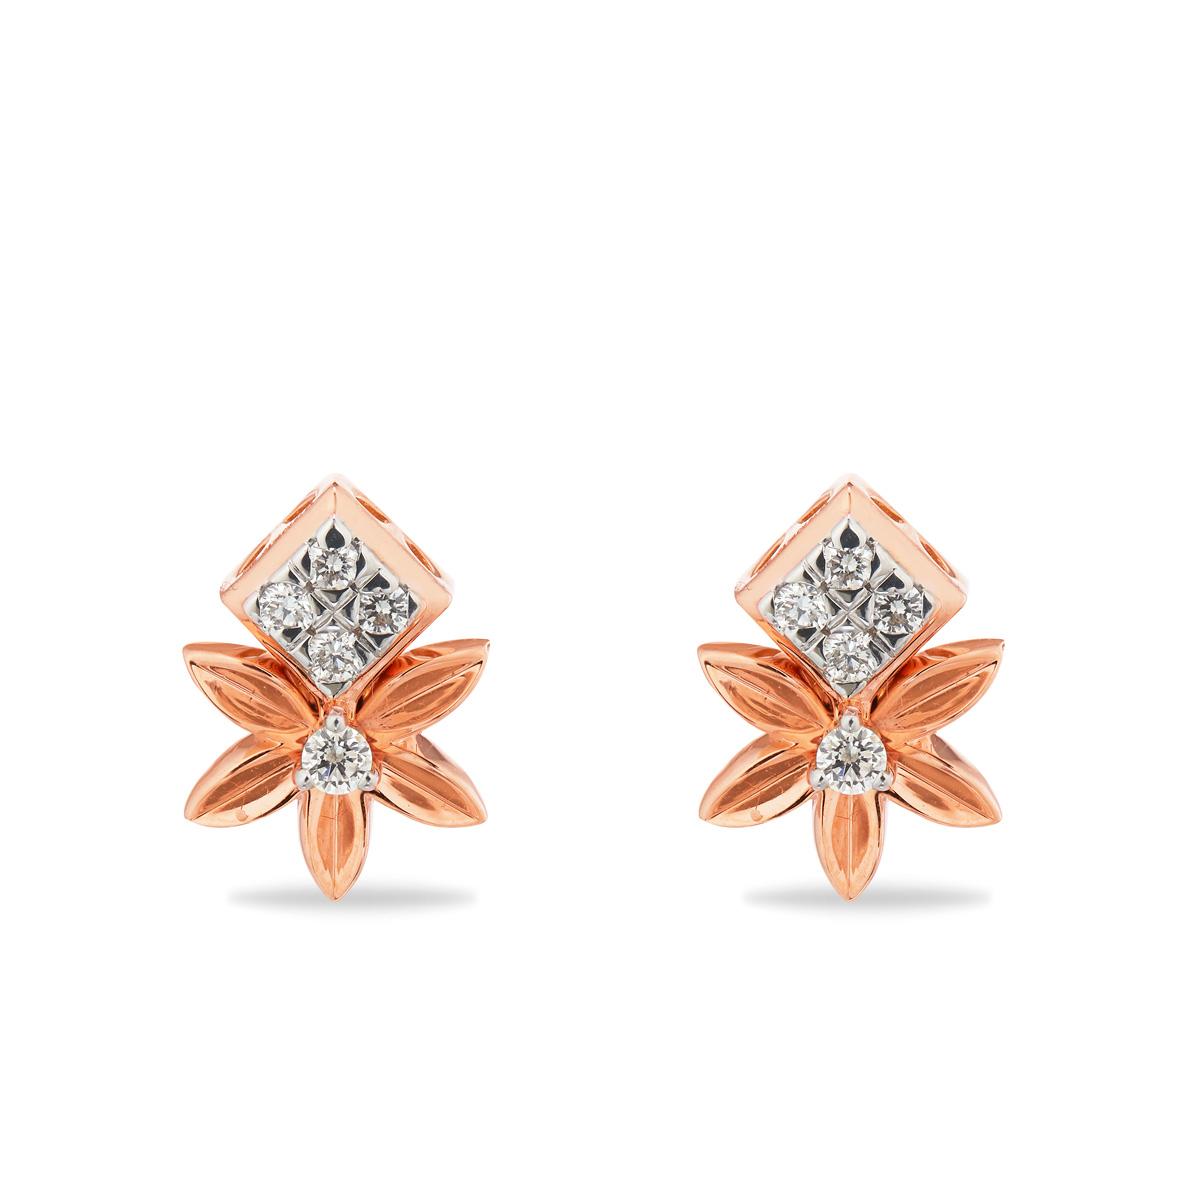 Quaint Floral Diamond Earring